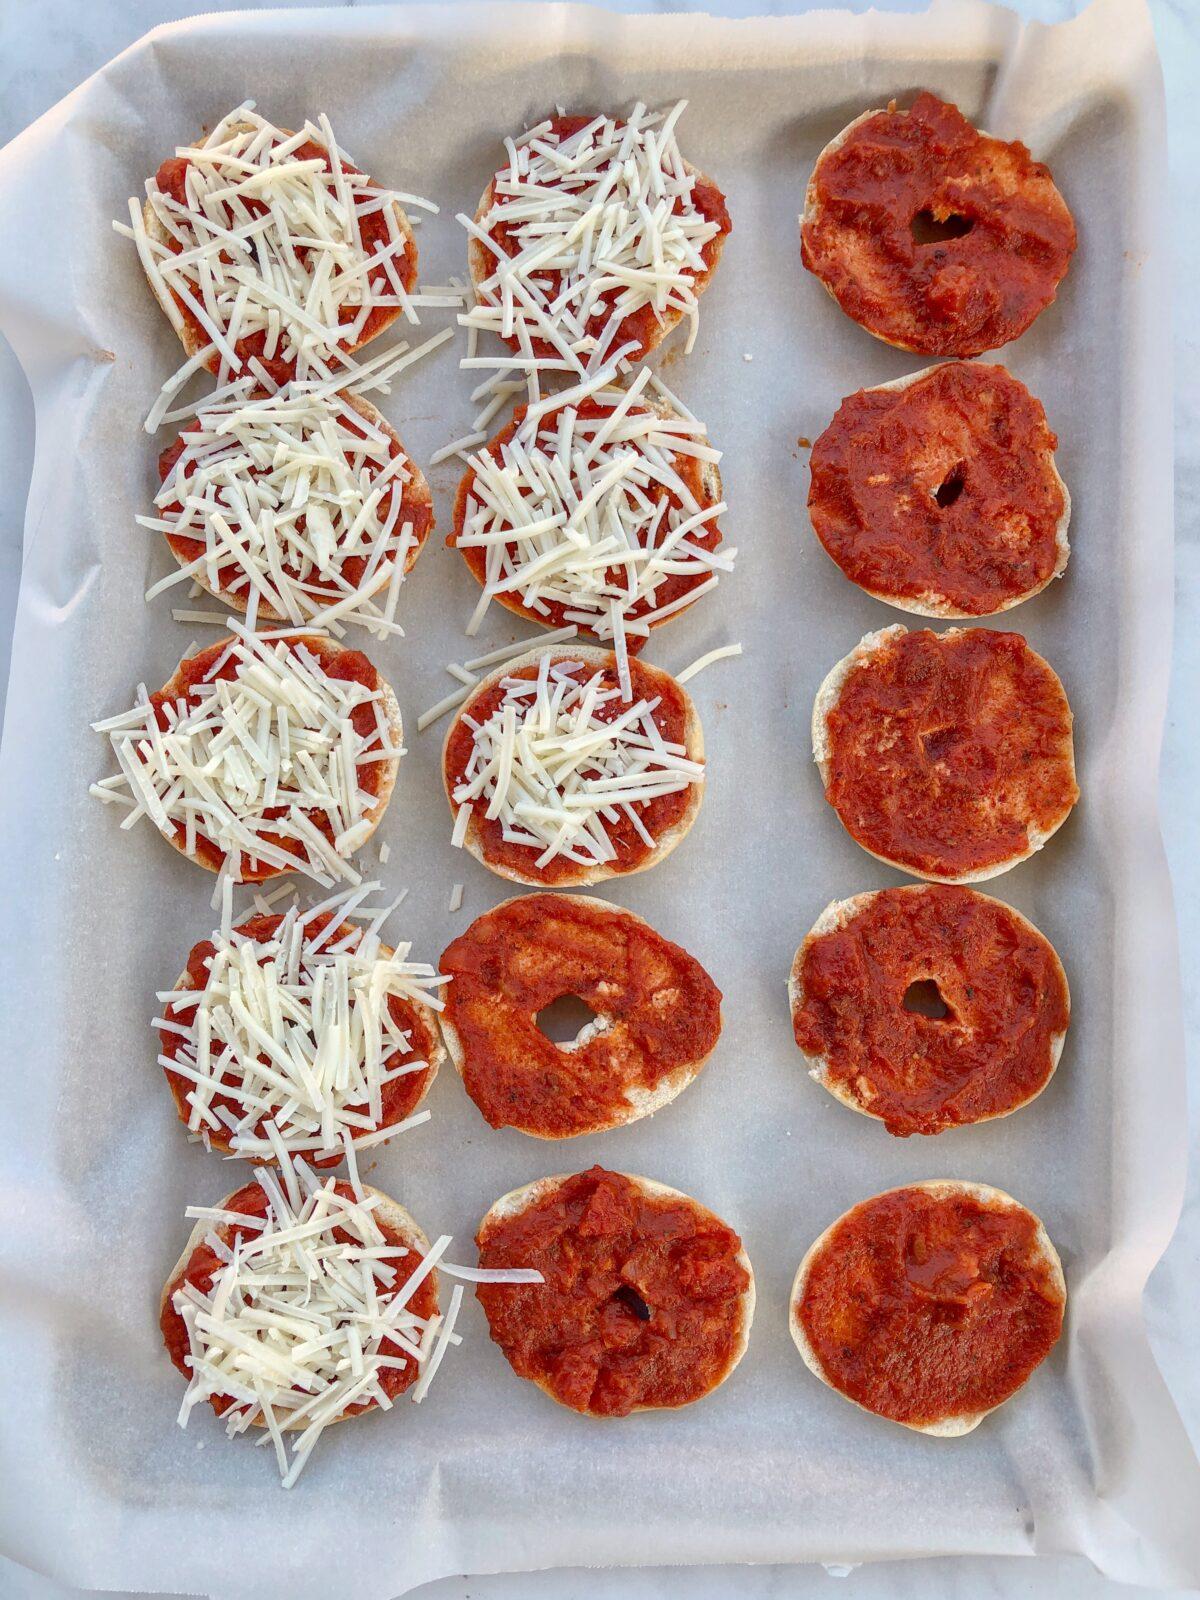 Make Homemade Vegan Bagel Bites